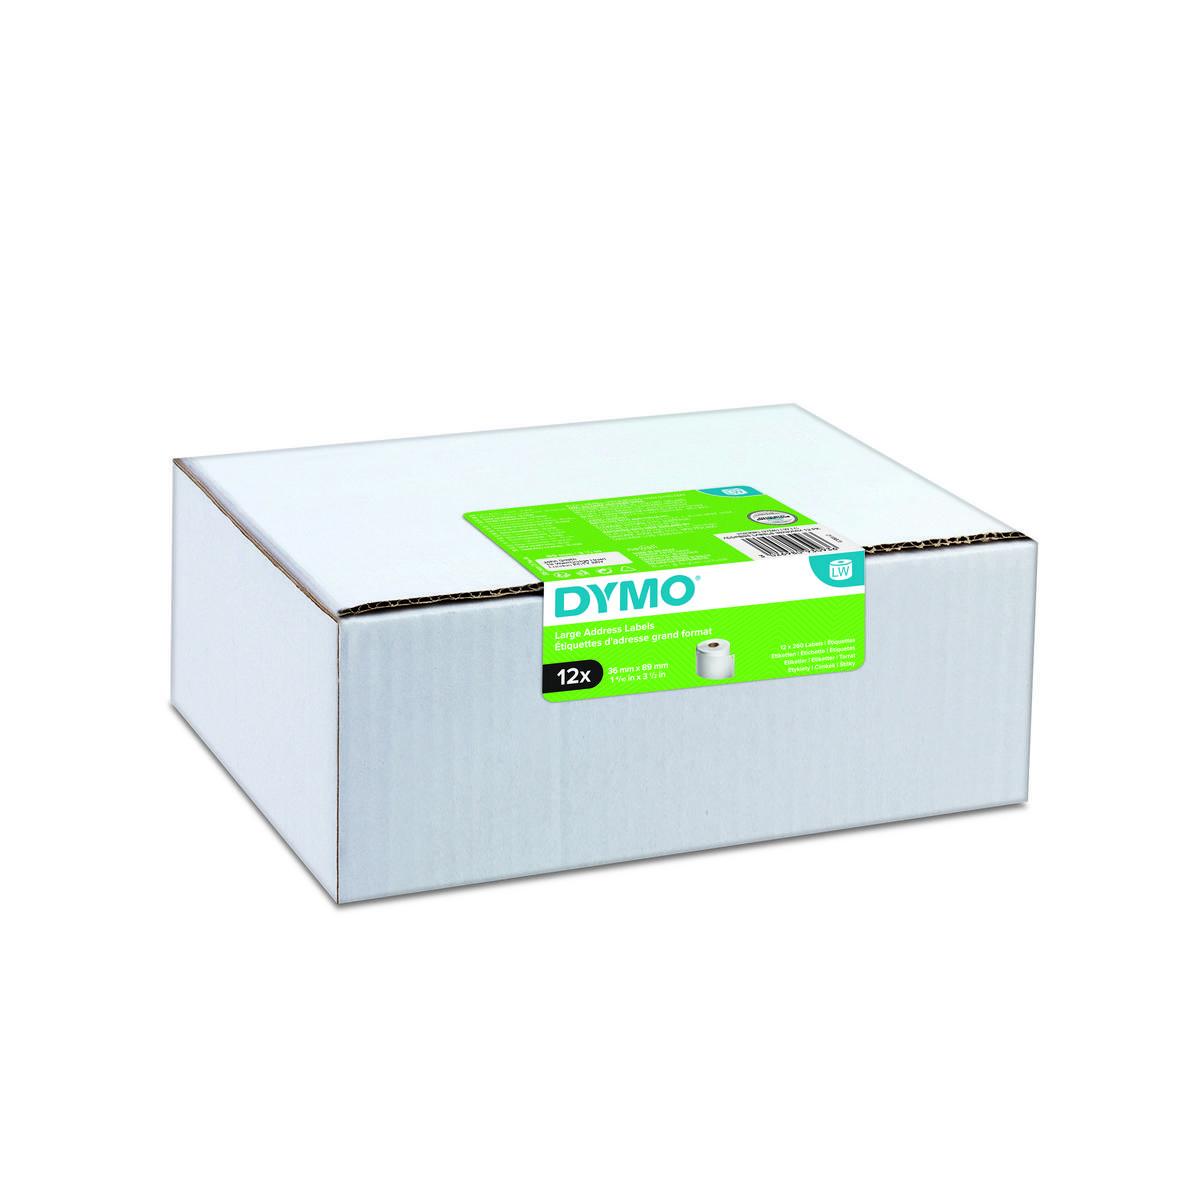 Dymo 2093093 - 89 x 36mm - wit papieren labels - 12 rollen